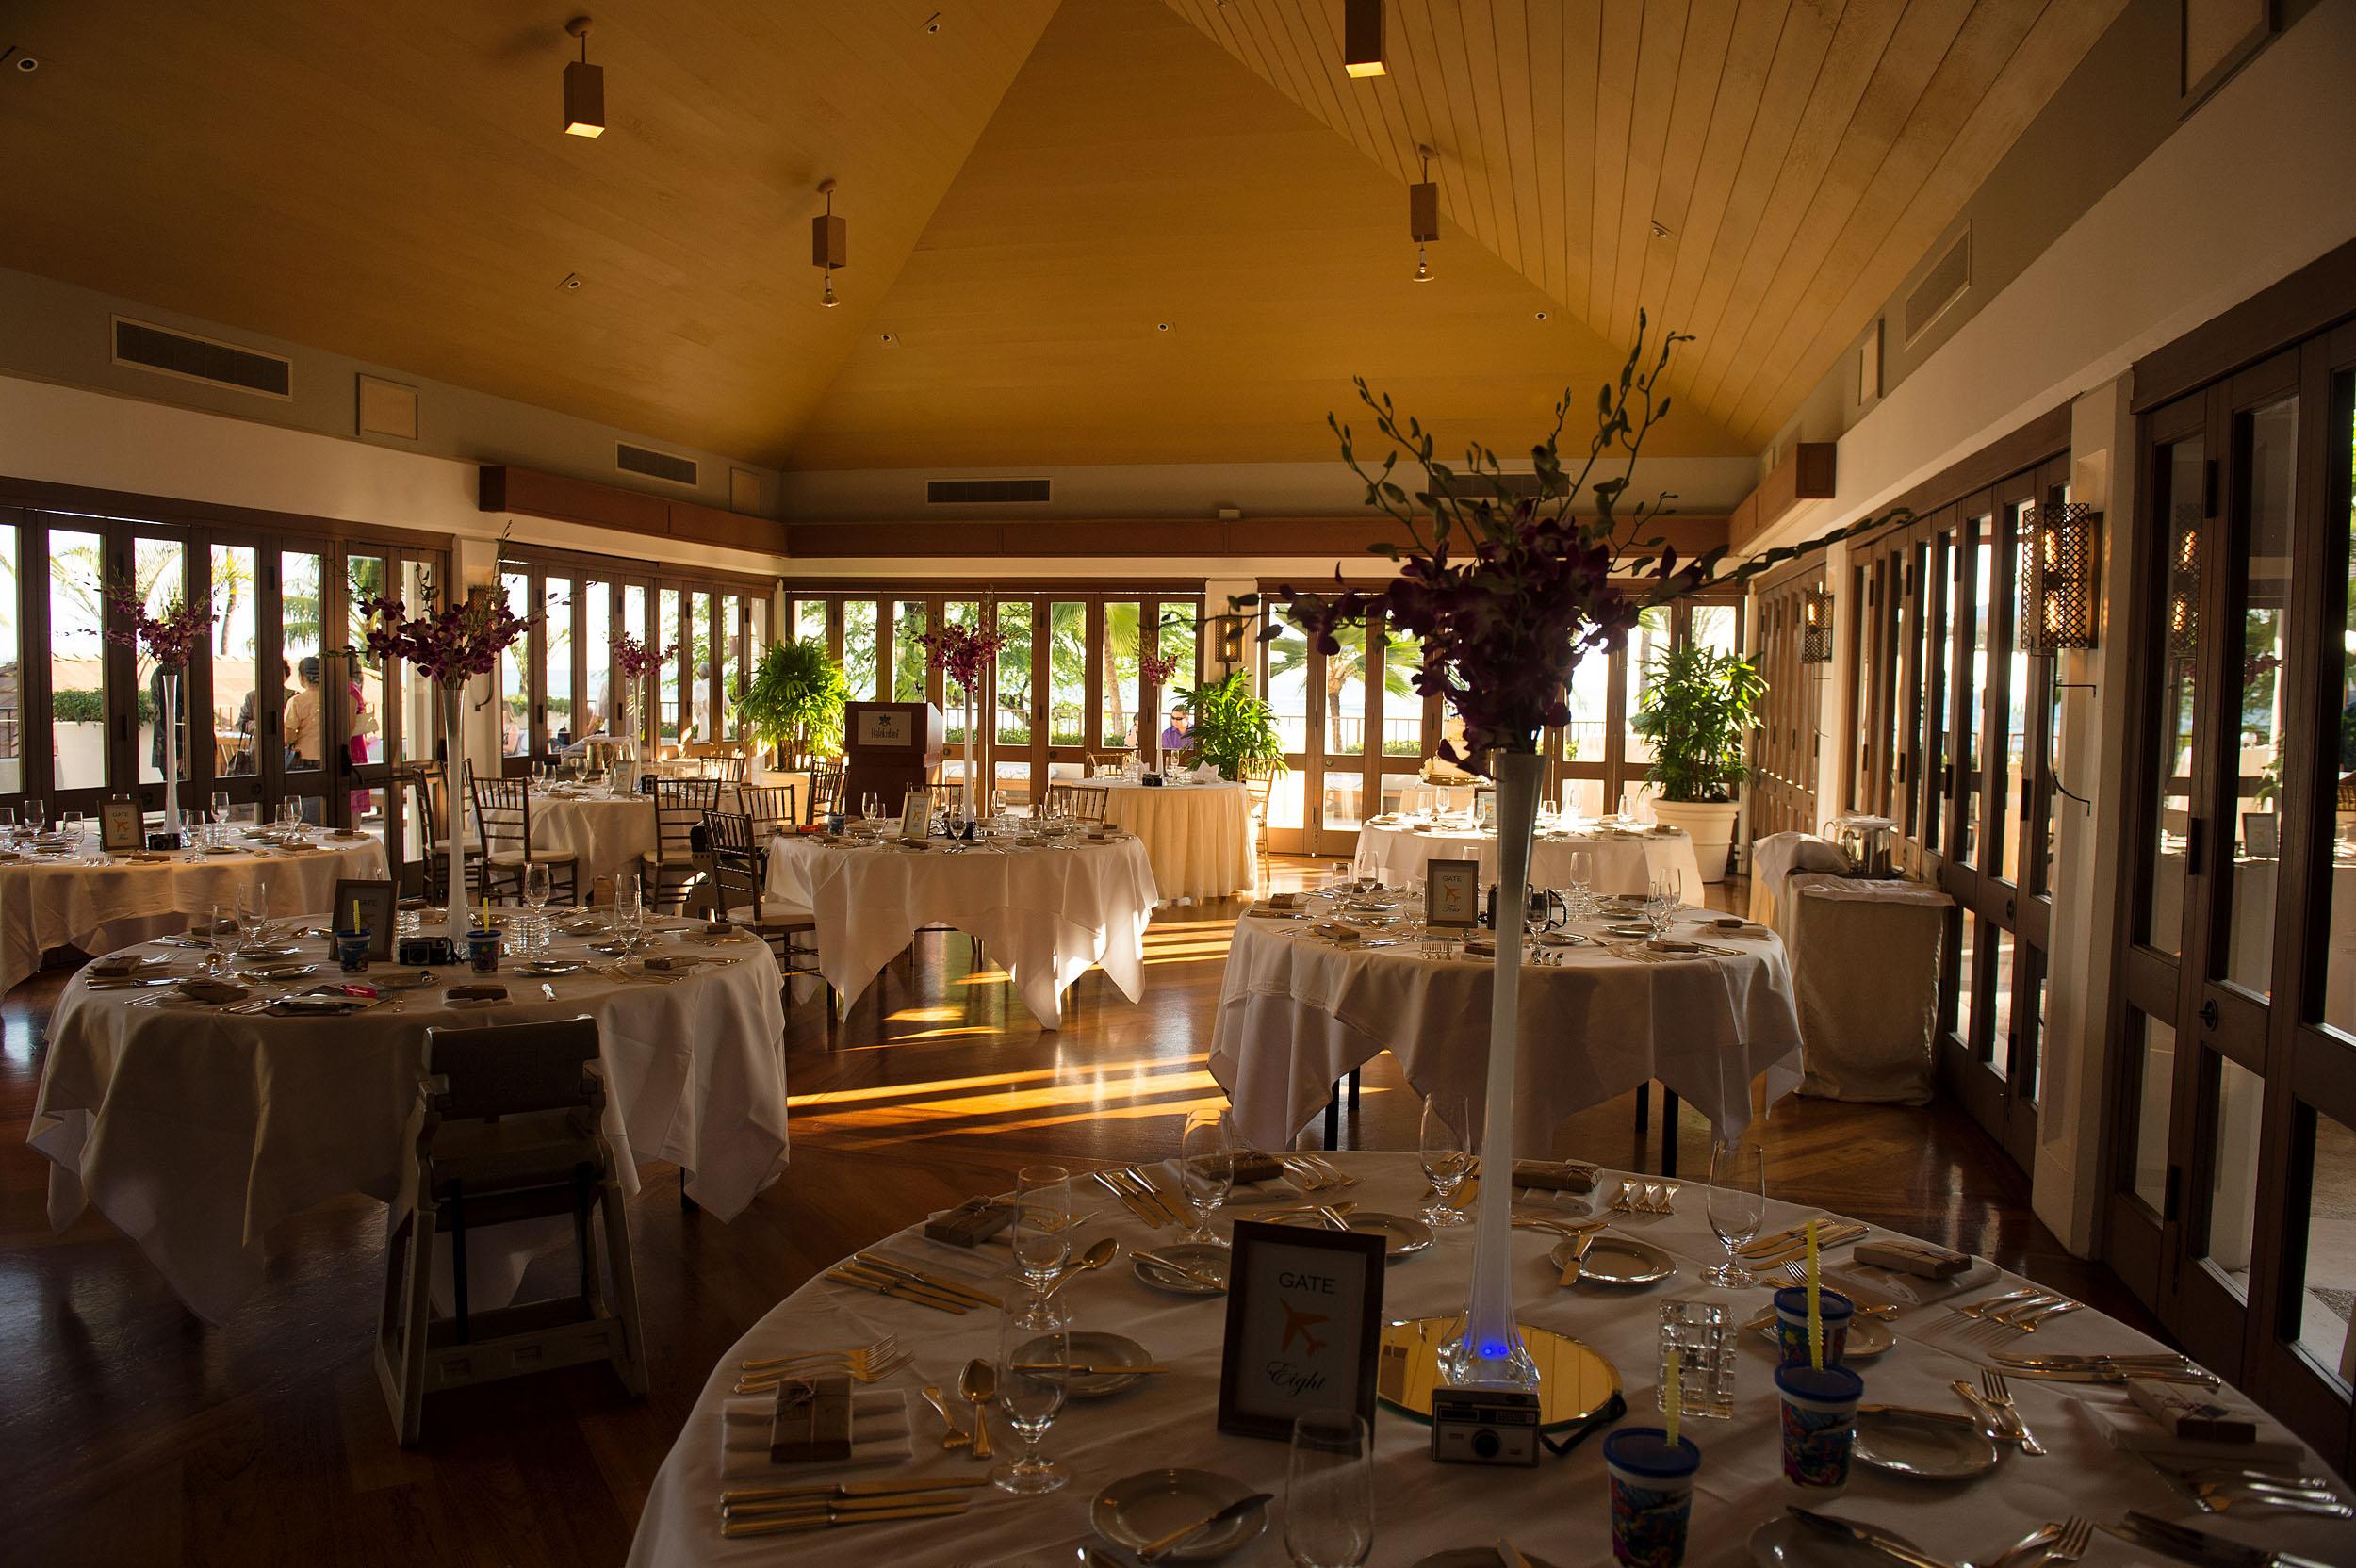 Wedding reception room at the Halekulani Hotel in Honolulu.